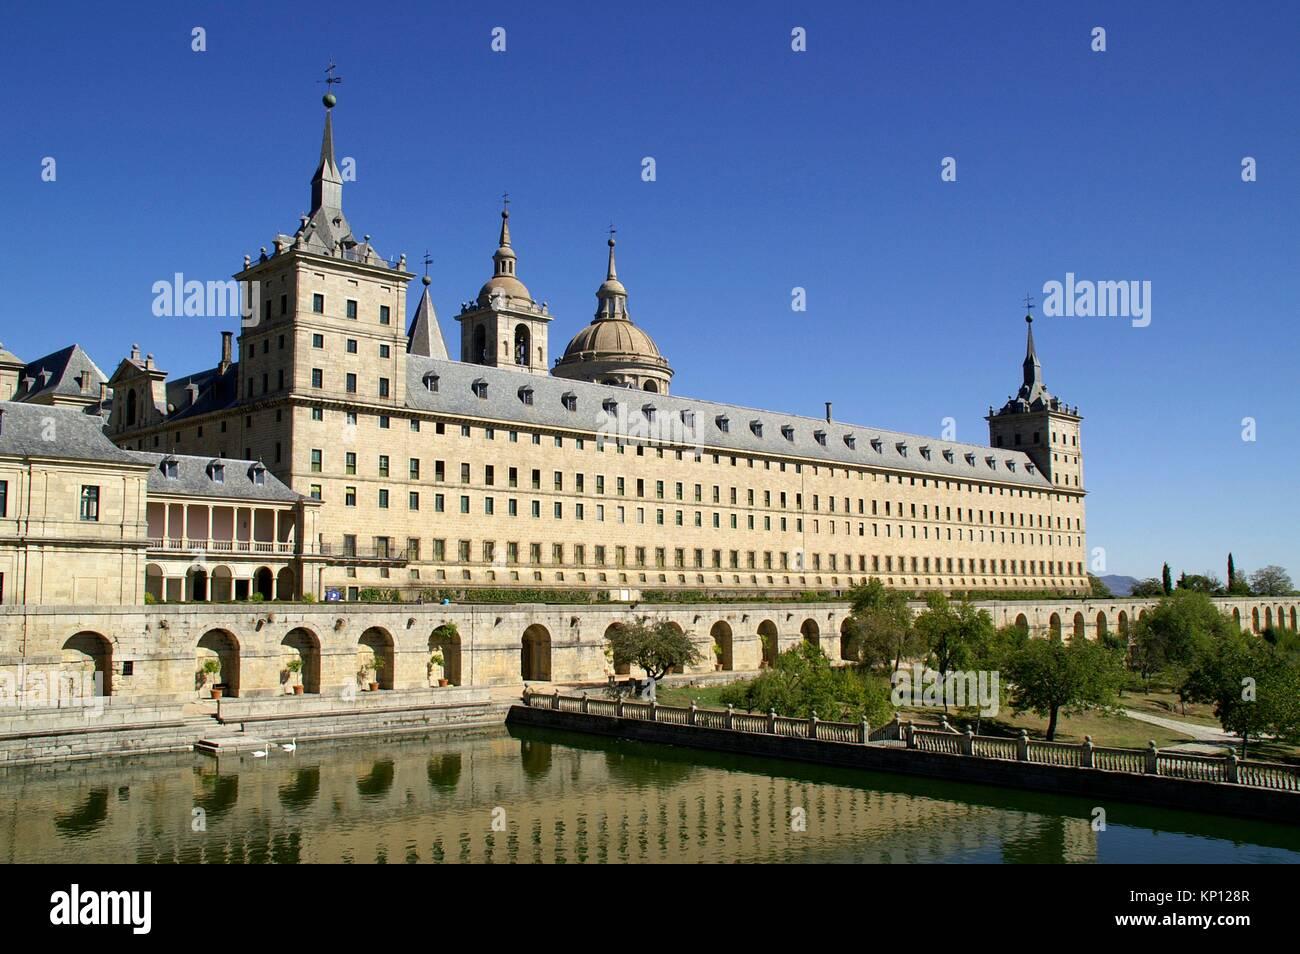 San Lorenzo del Escorial (Madrid) Spain. Front yard of the Monastery of San Lorenzo del Escorial. - Stock Image